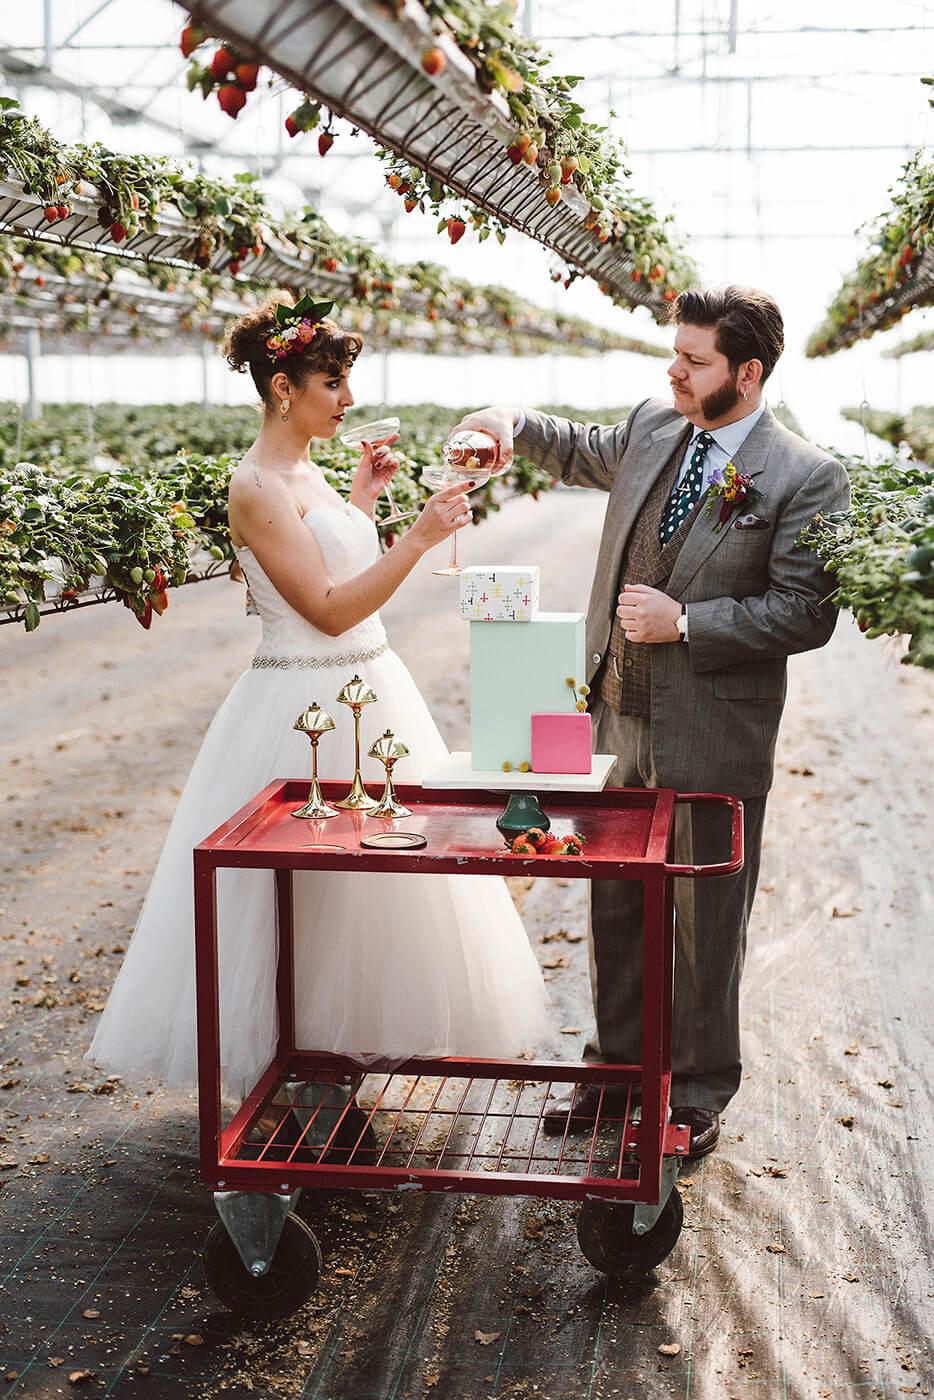 roma-organizacao-eventos-editorial-mid-century-modern-wedding-in-a-strawberry-field-27